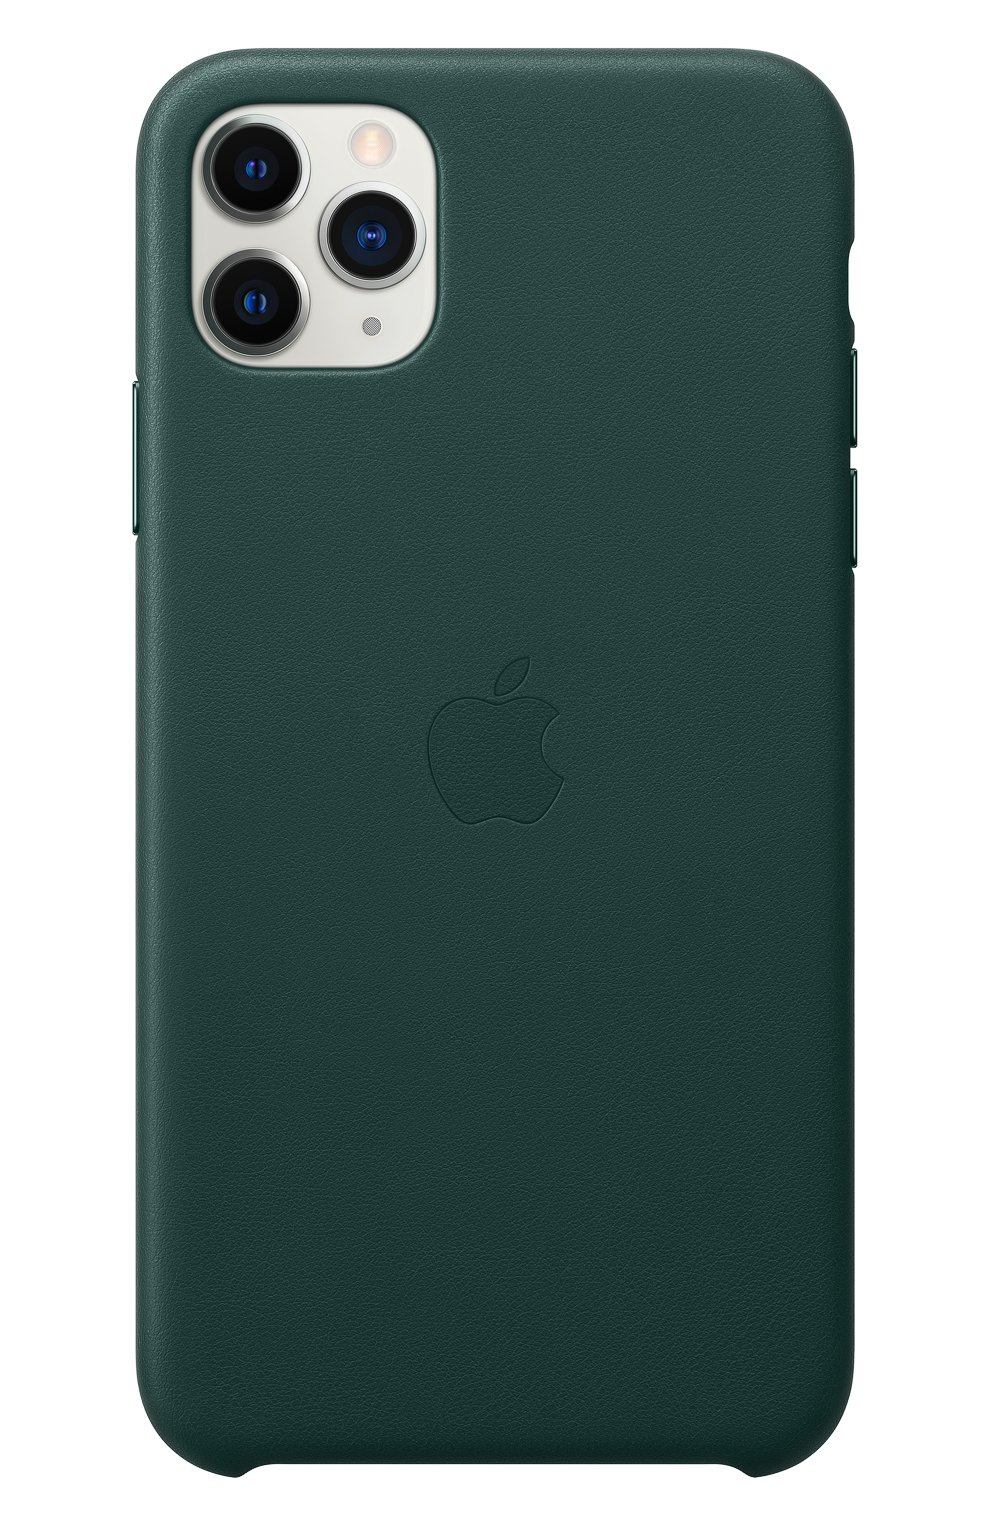 Кожаный чехол для iphone 11 pro max APPLE  темно-зеленого цвета, арт. MX0C2ZM/A | Фото 3